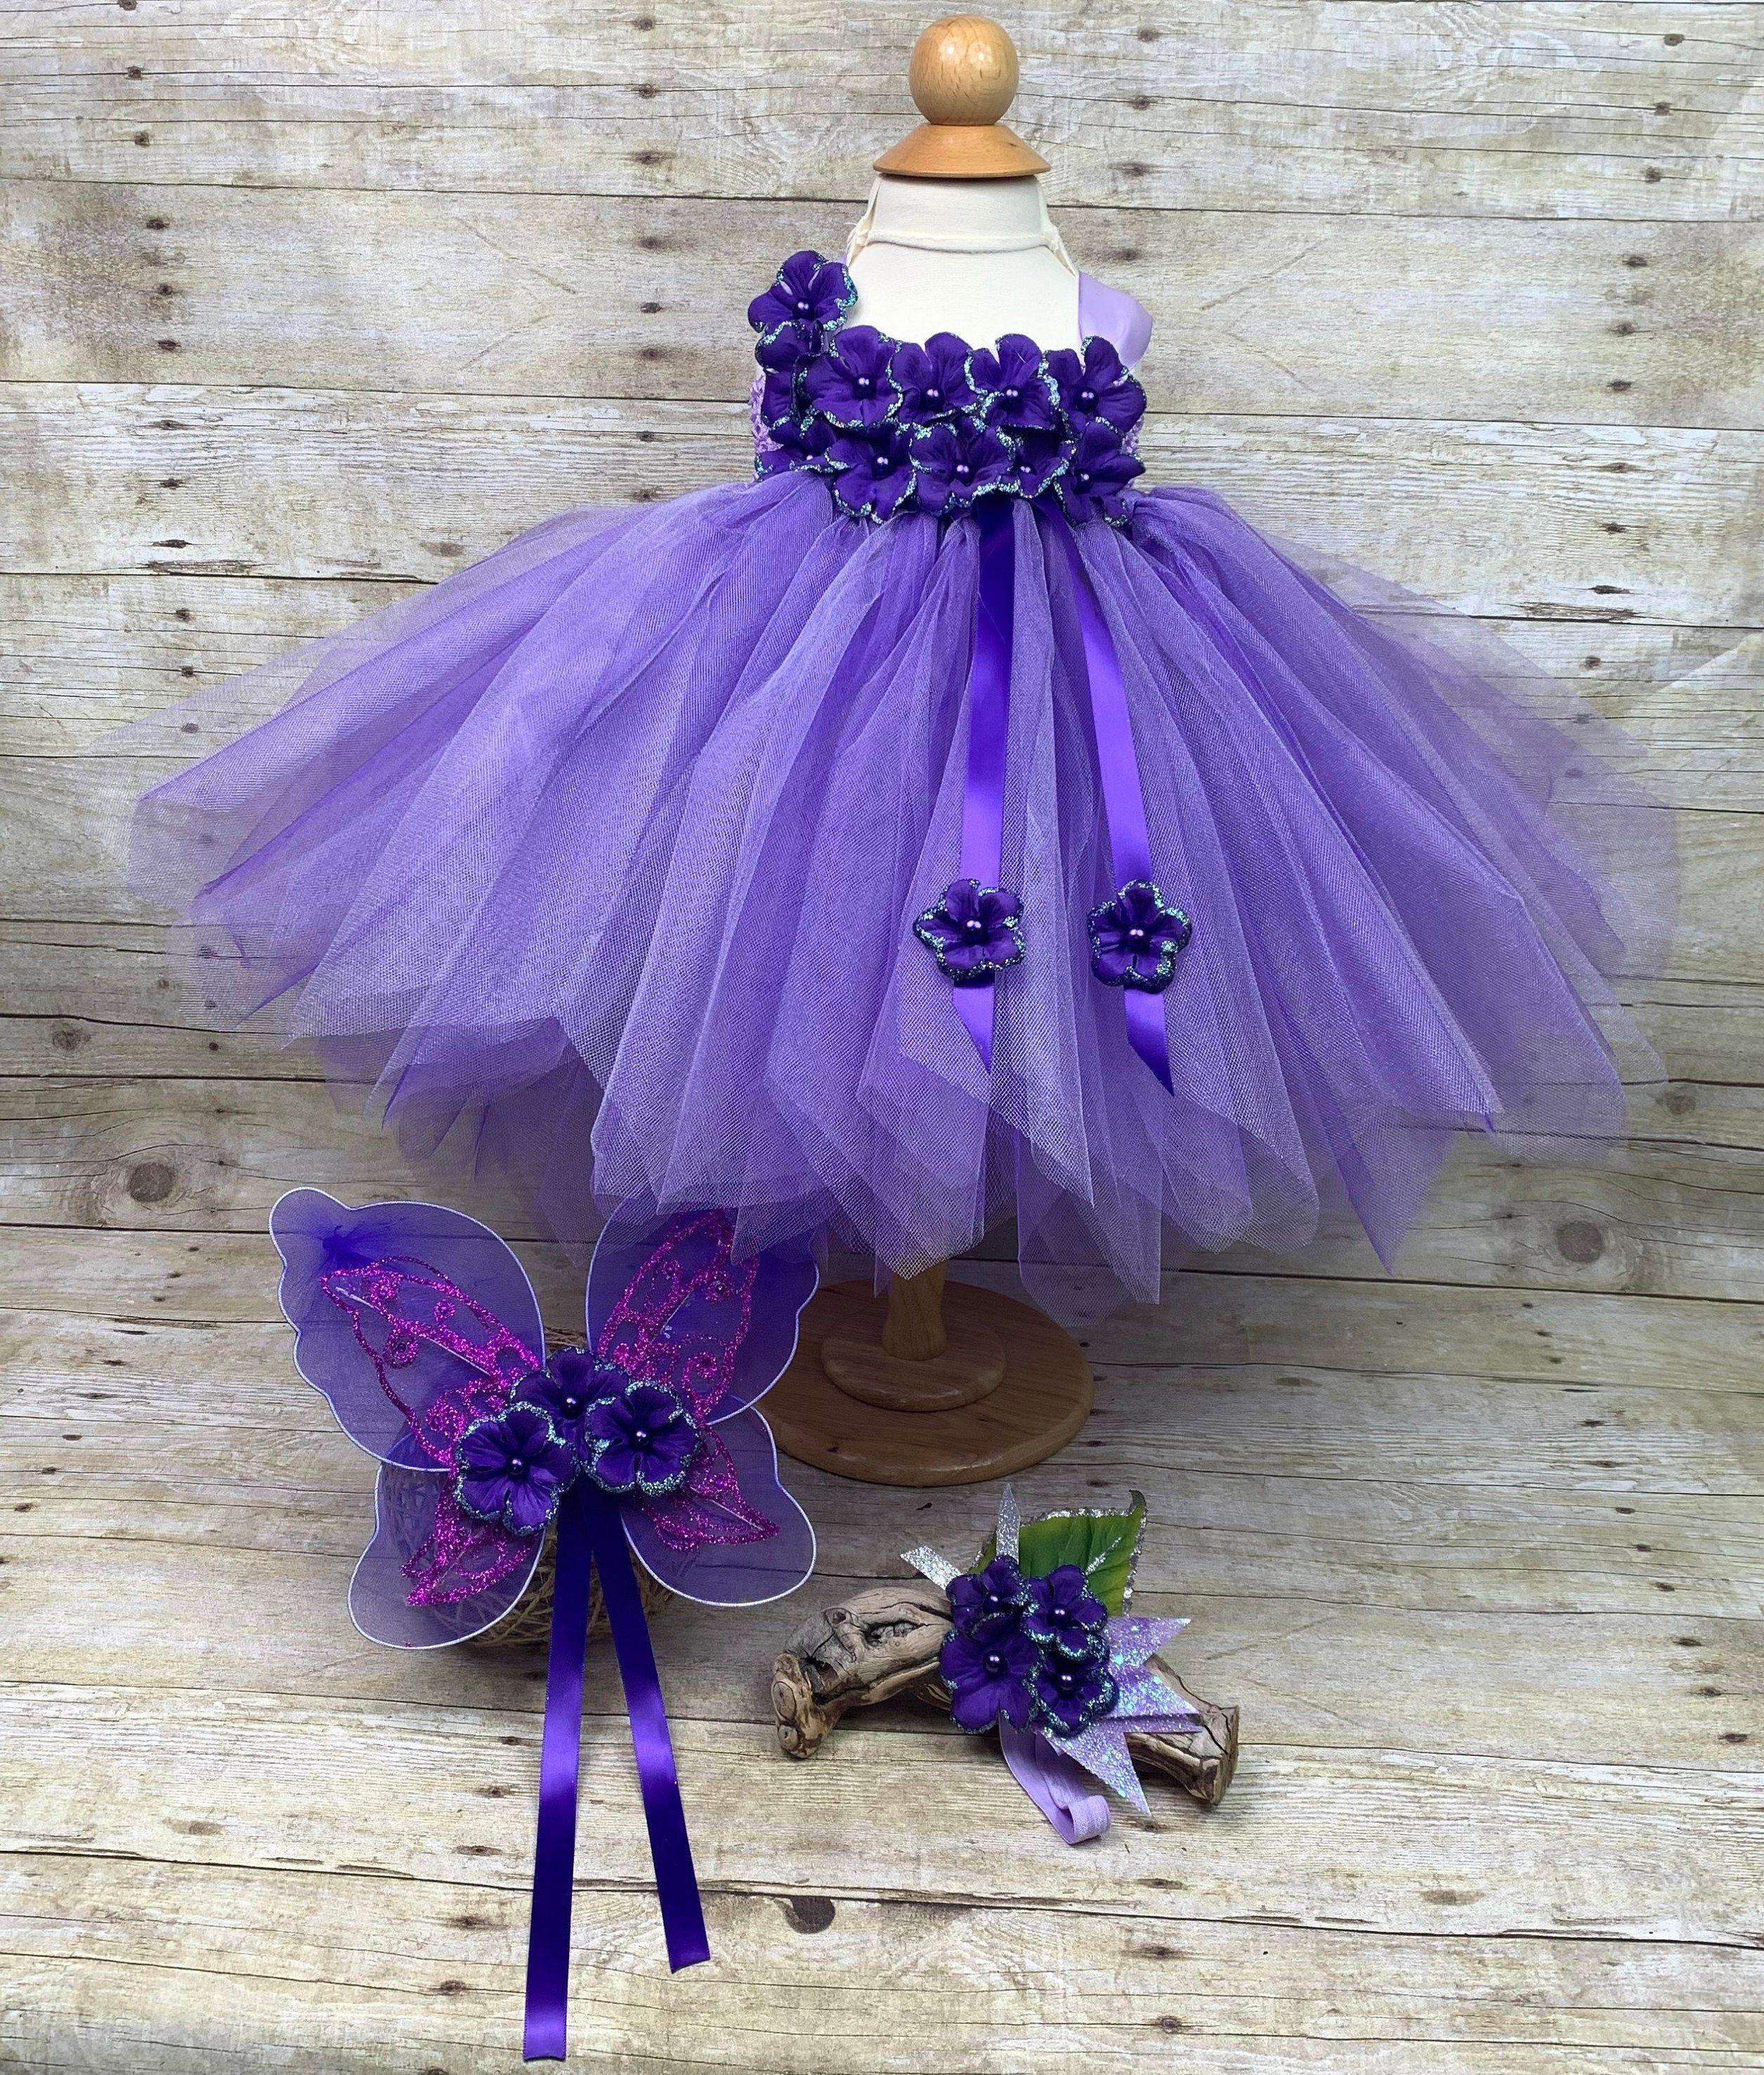 Lavender Purple Tutu Dress Fairy Wings Headband 12 24 Etsy Little Girl Pageant Dresses Purple Tutu Dress Tutu Dress [ 2953 x 2511 Pixel ]